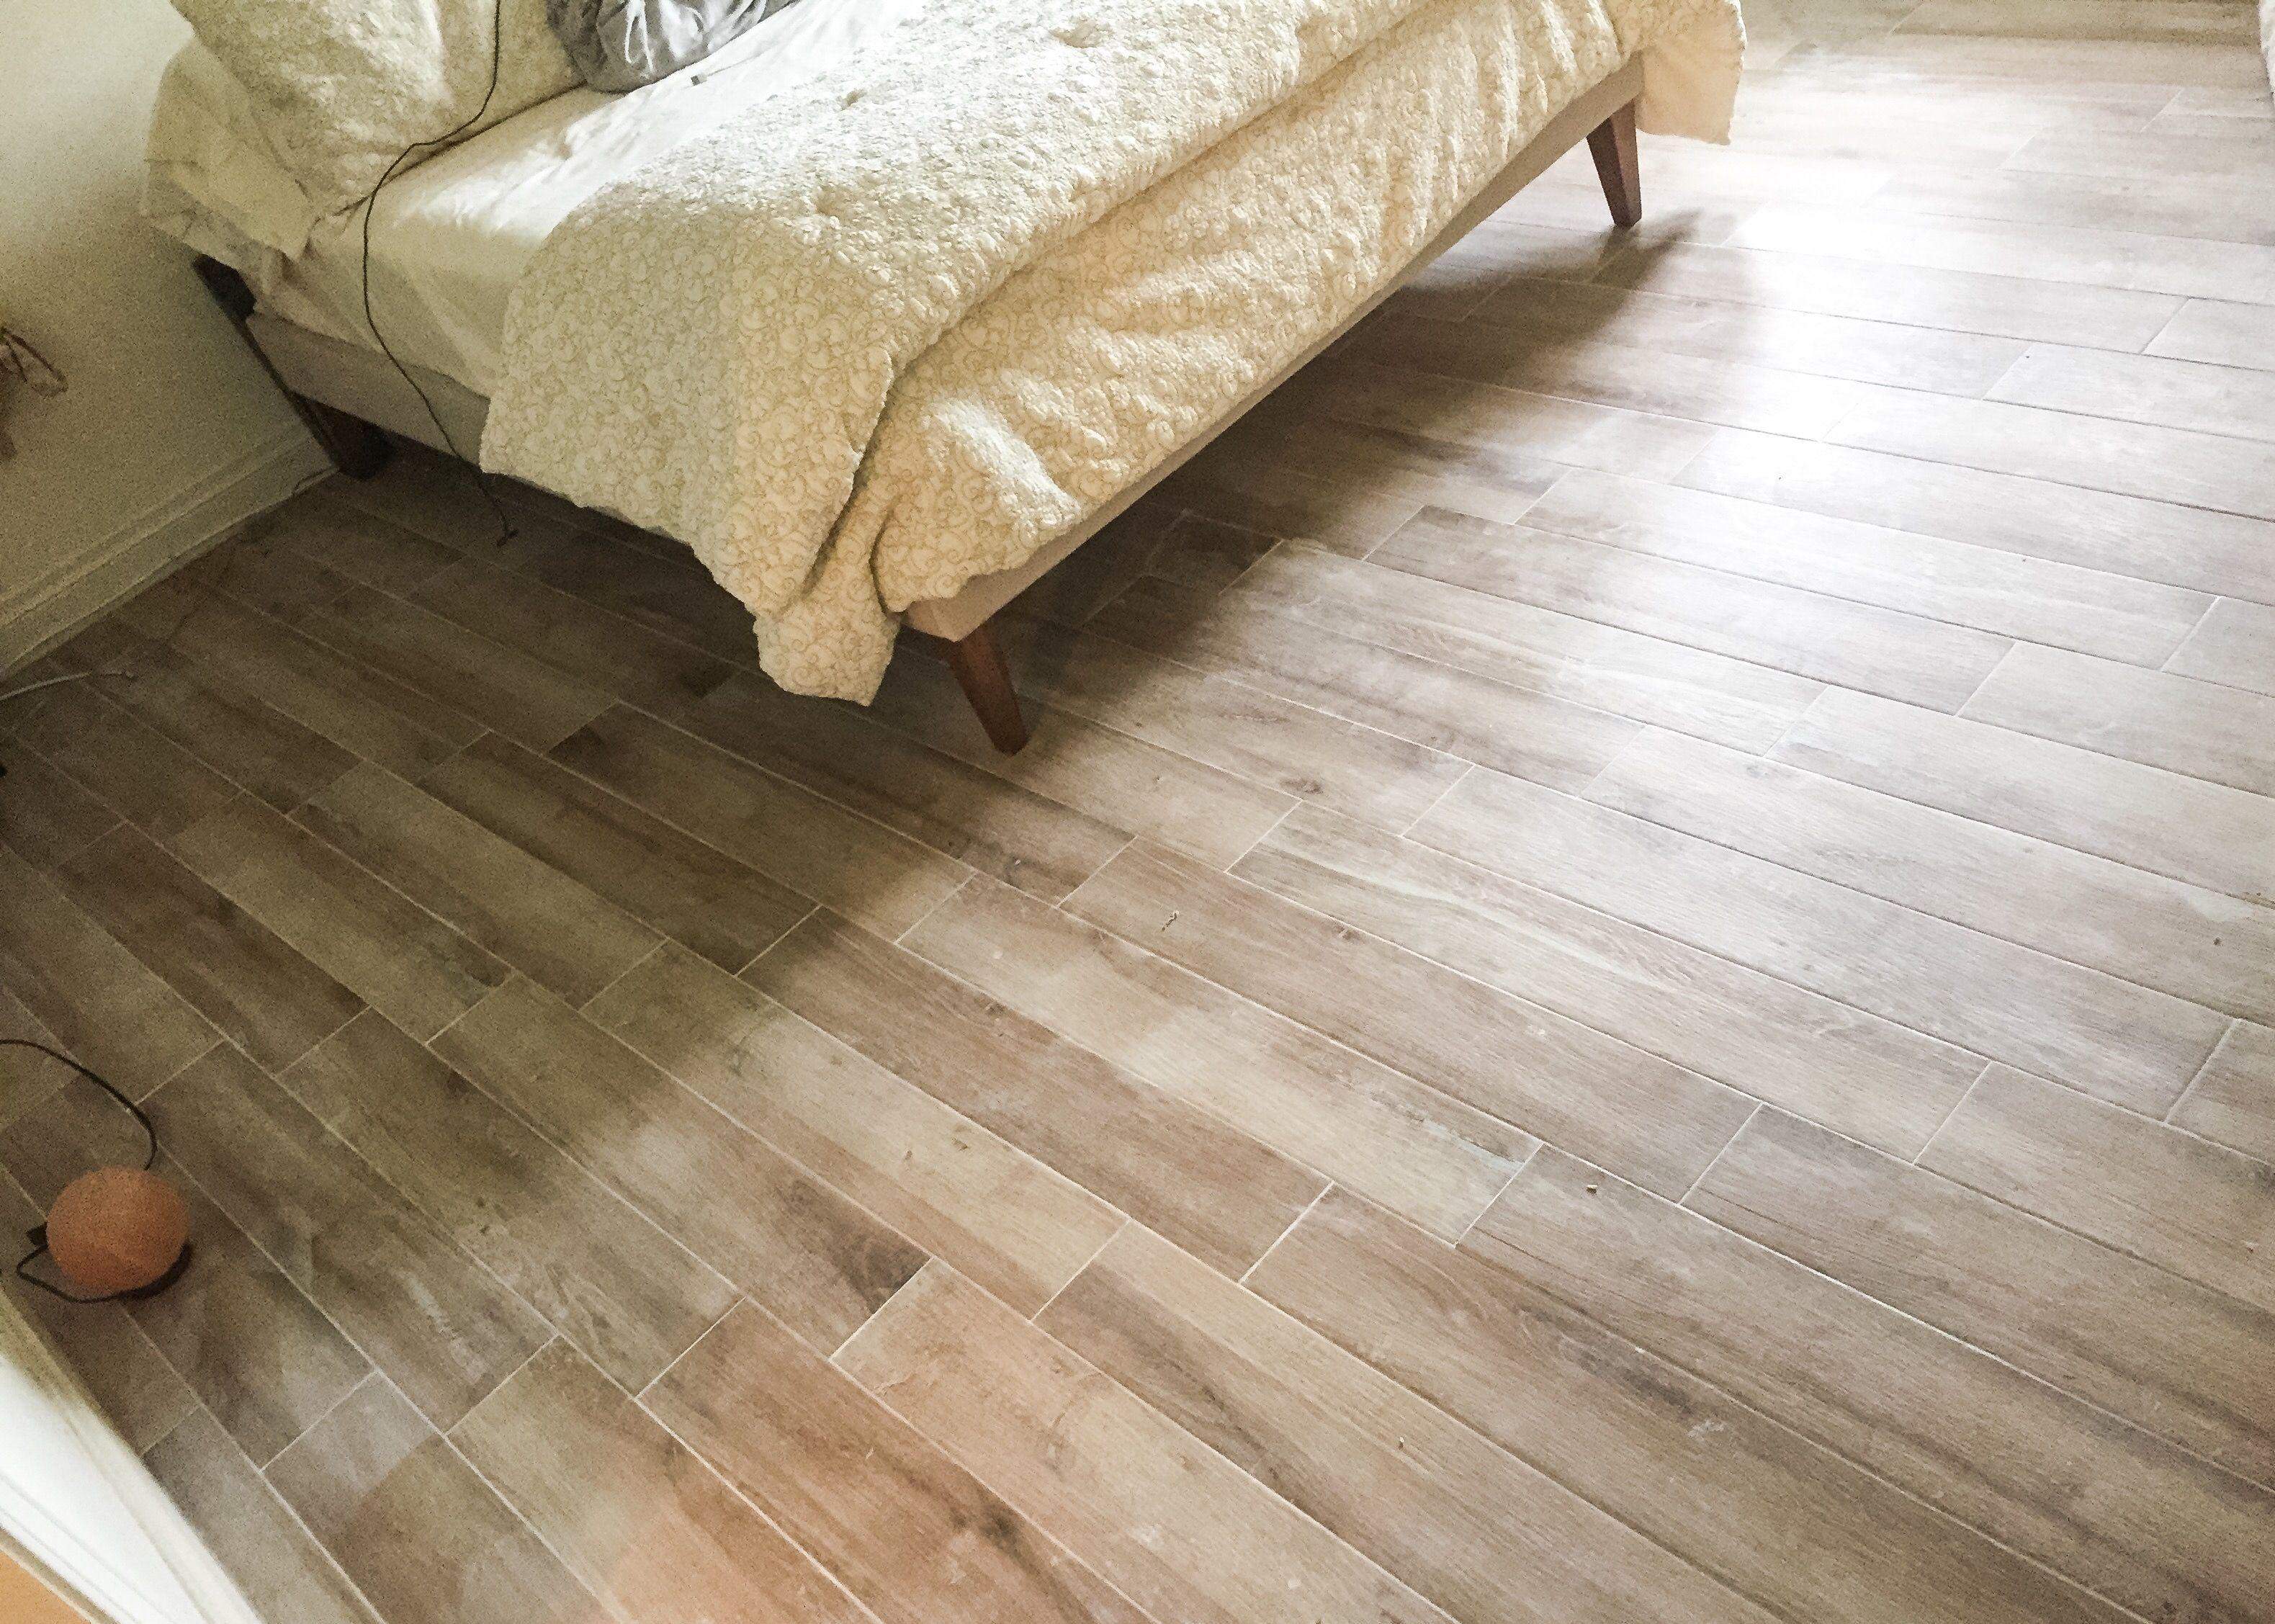 Dallas teka 6 in x 36 in porcelain wood tile tile floors porcelain wood tile dailygadgetfo Image collections